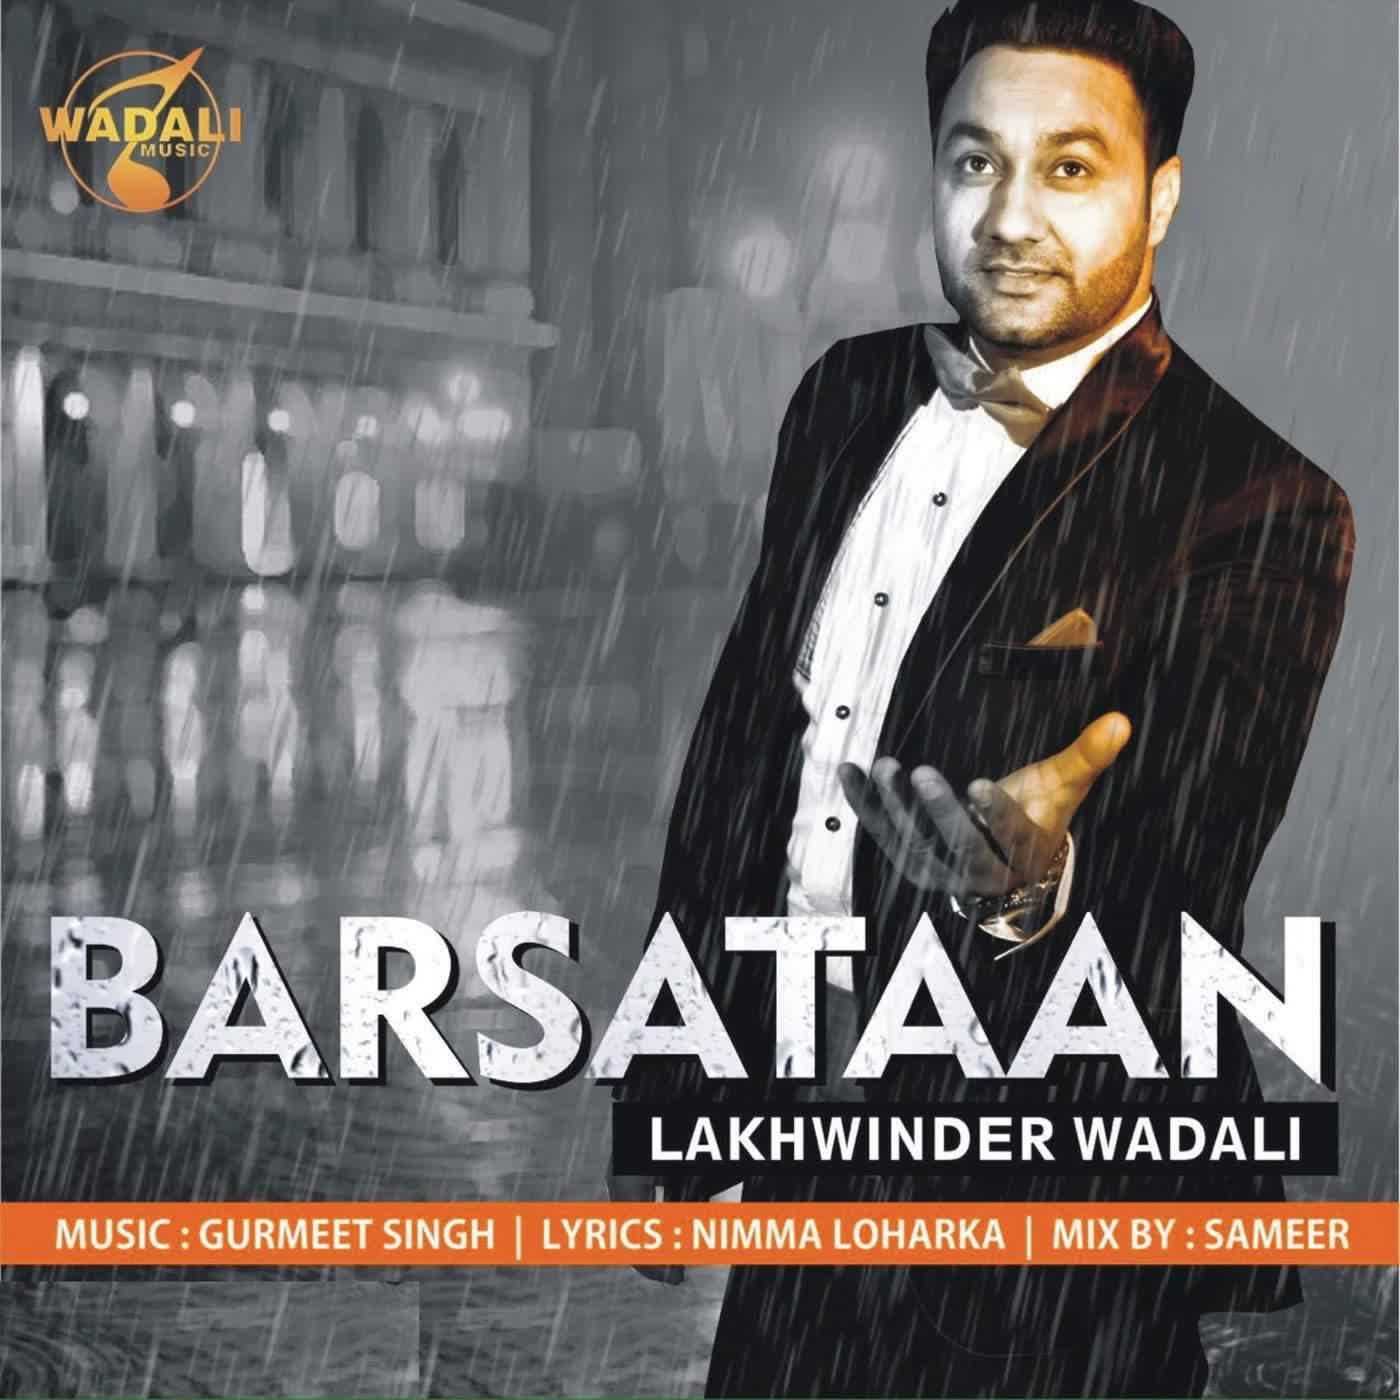 Barsataan Lakhwinder Wadali Mp3 Song